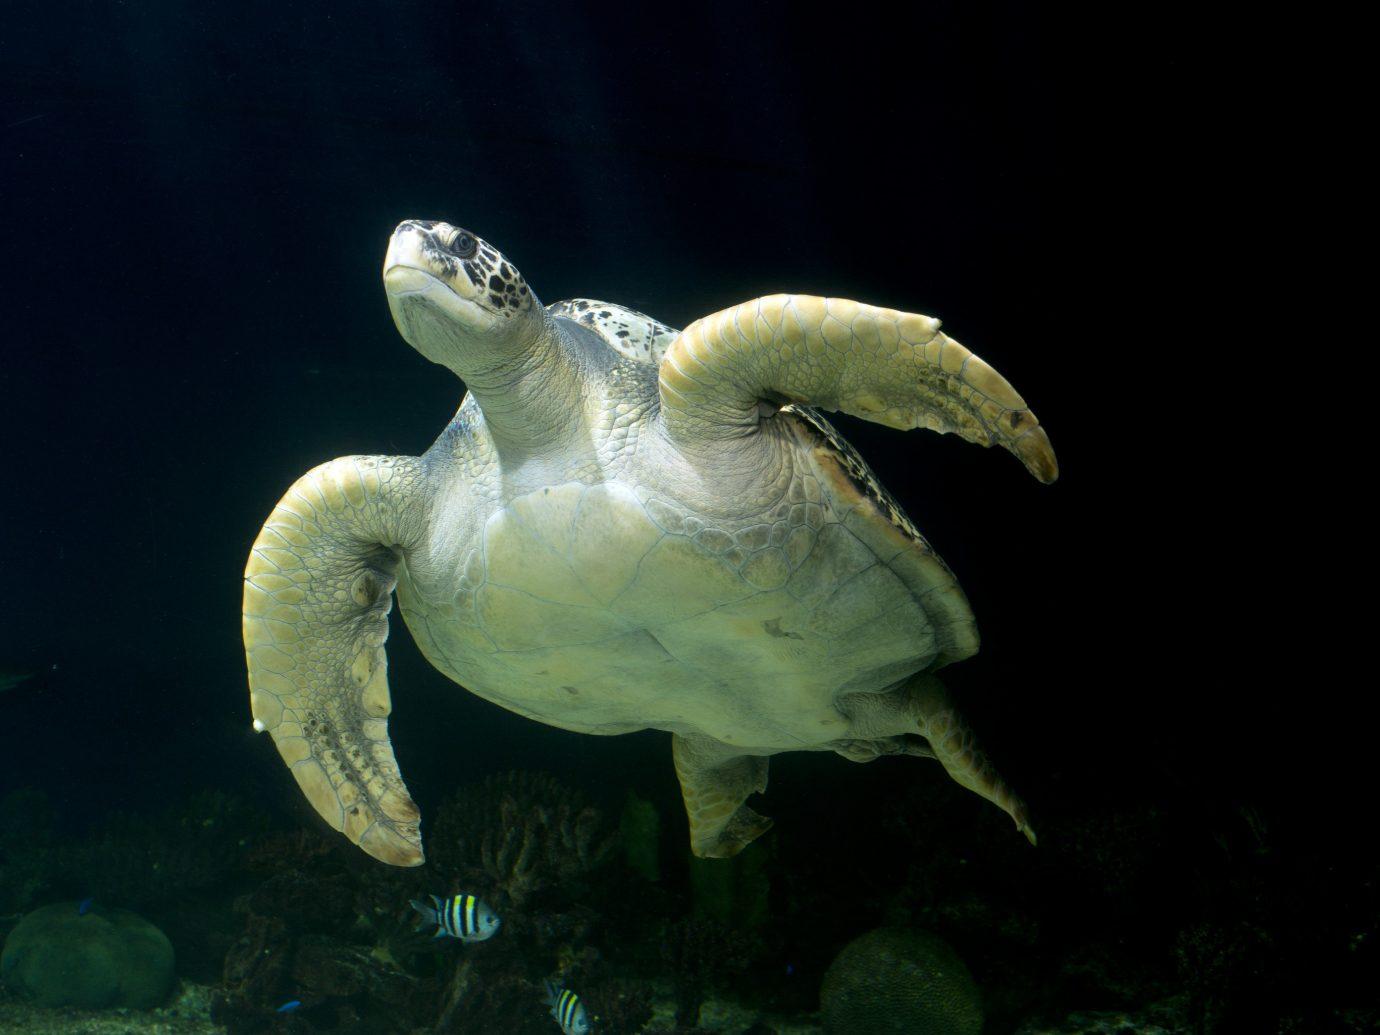 Trip Ideas reptile animal turtle vertebrate marine biology fauna biology underwater sea turtle